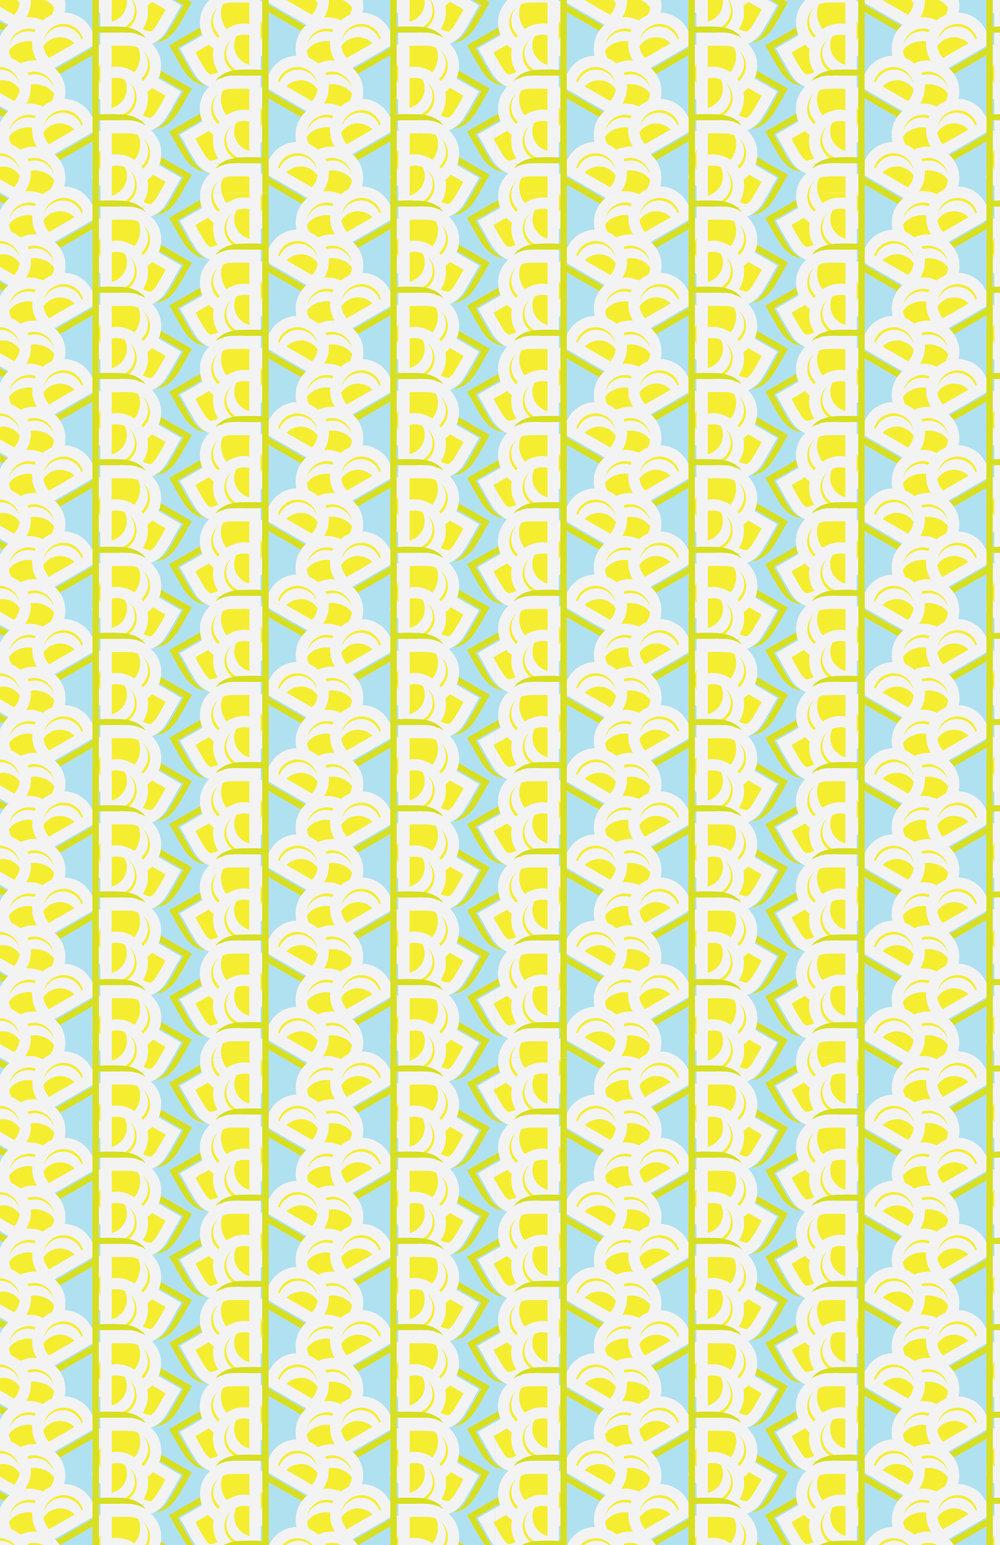 pattern1-02.jpg